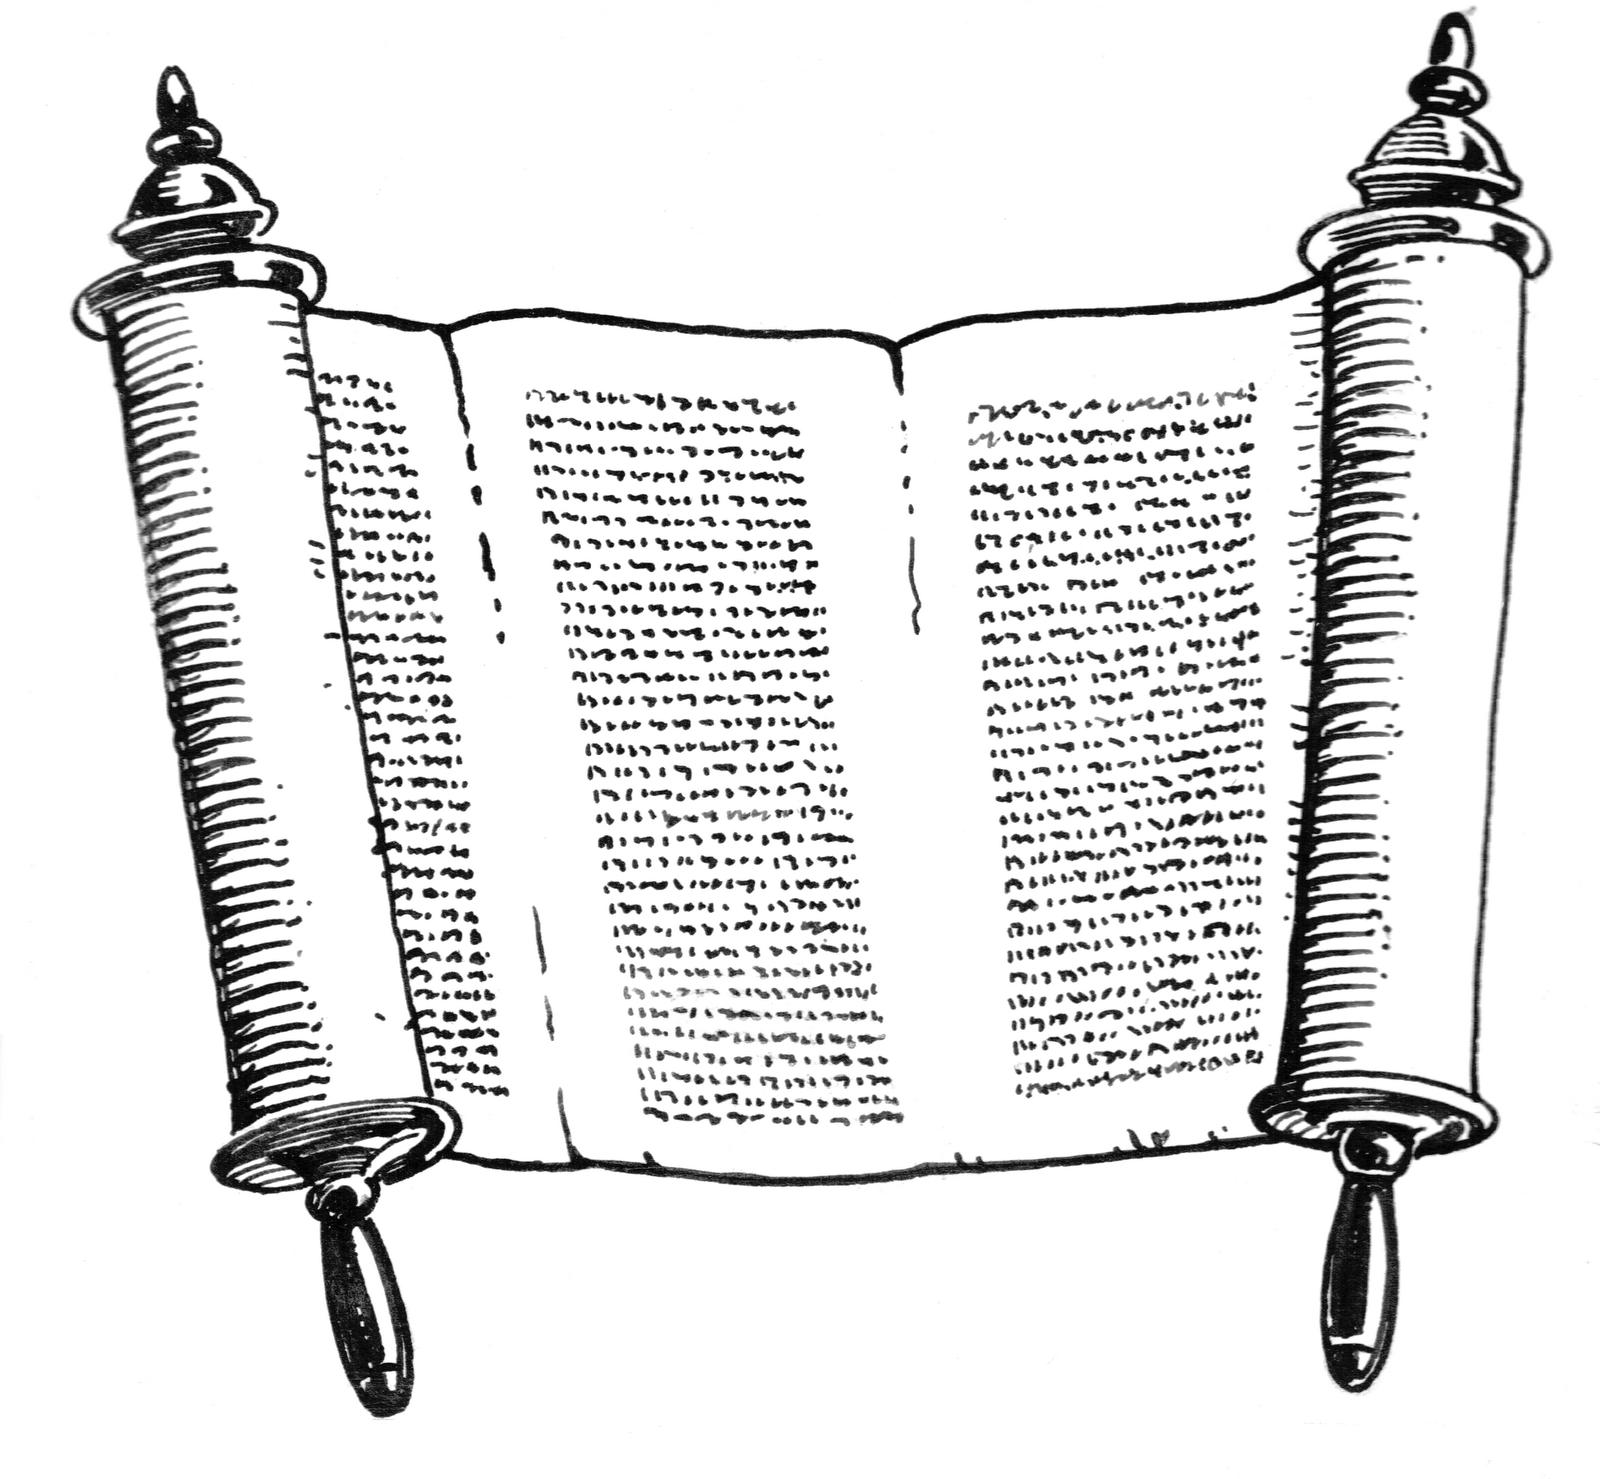 Dead sea scrolls clipart jpg freeuse download Free Scrolls, Download Free Clip Art, Free Clip Art on Clipart Library jpg freeuse download